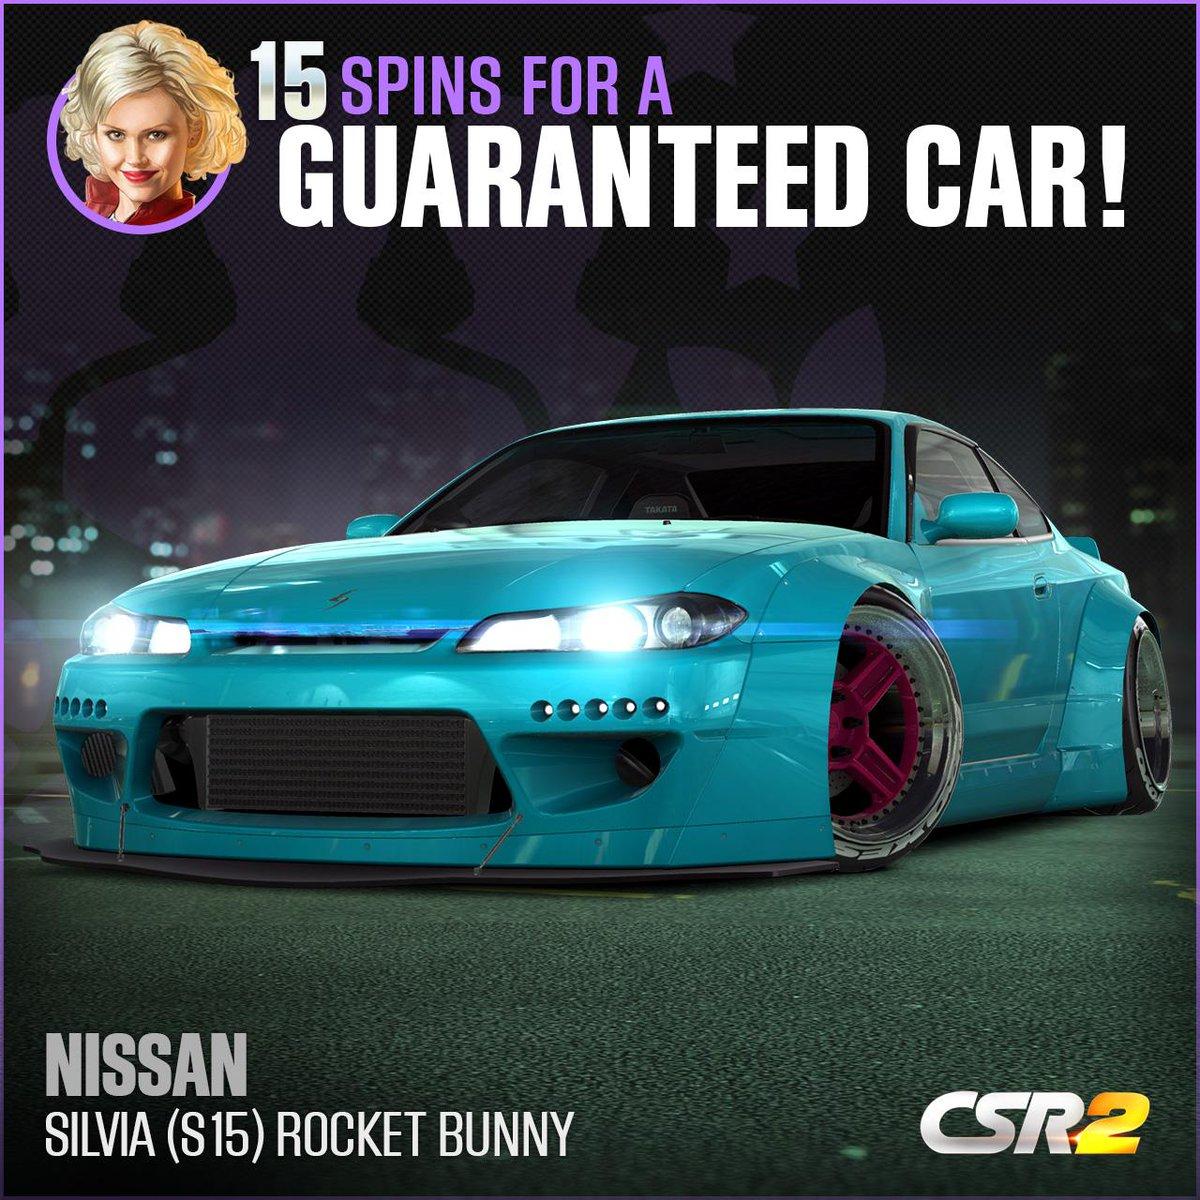 S Rocket Bunny Csr  Prestige Car